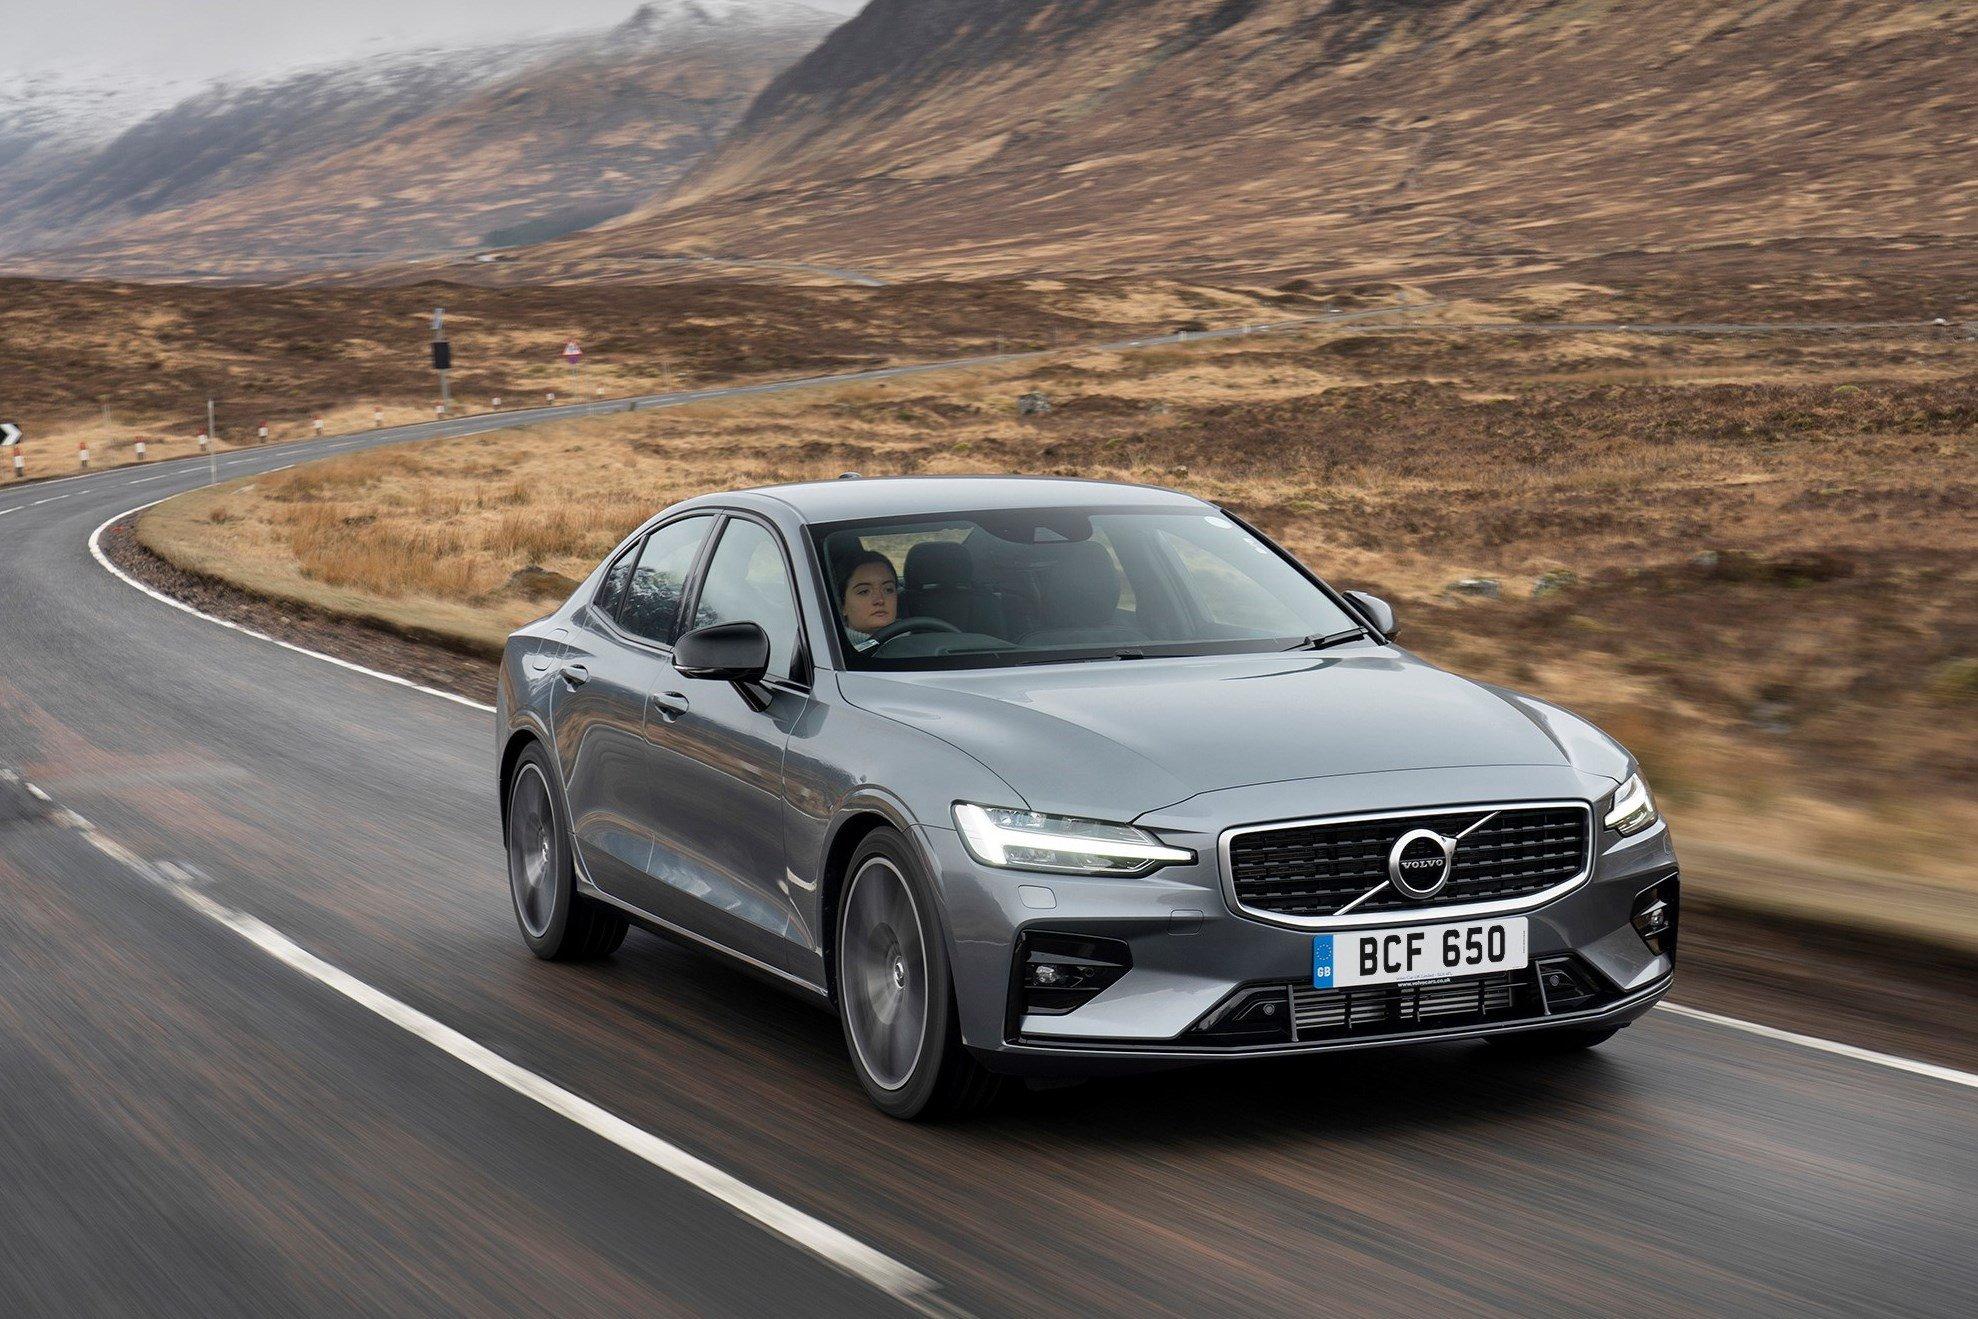 2019 Volvo S60 dynamic